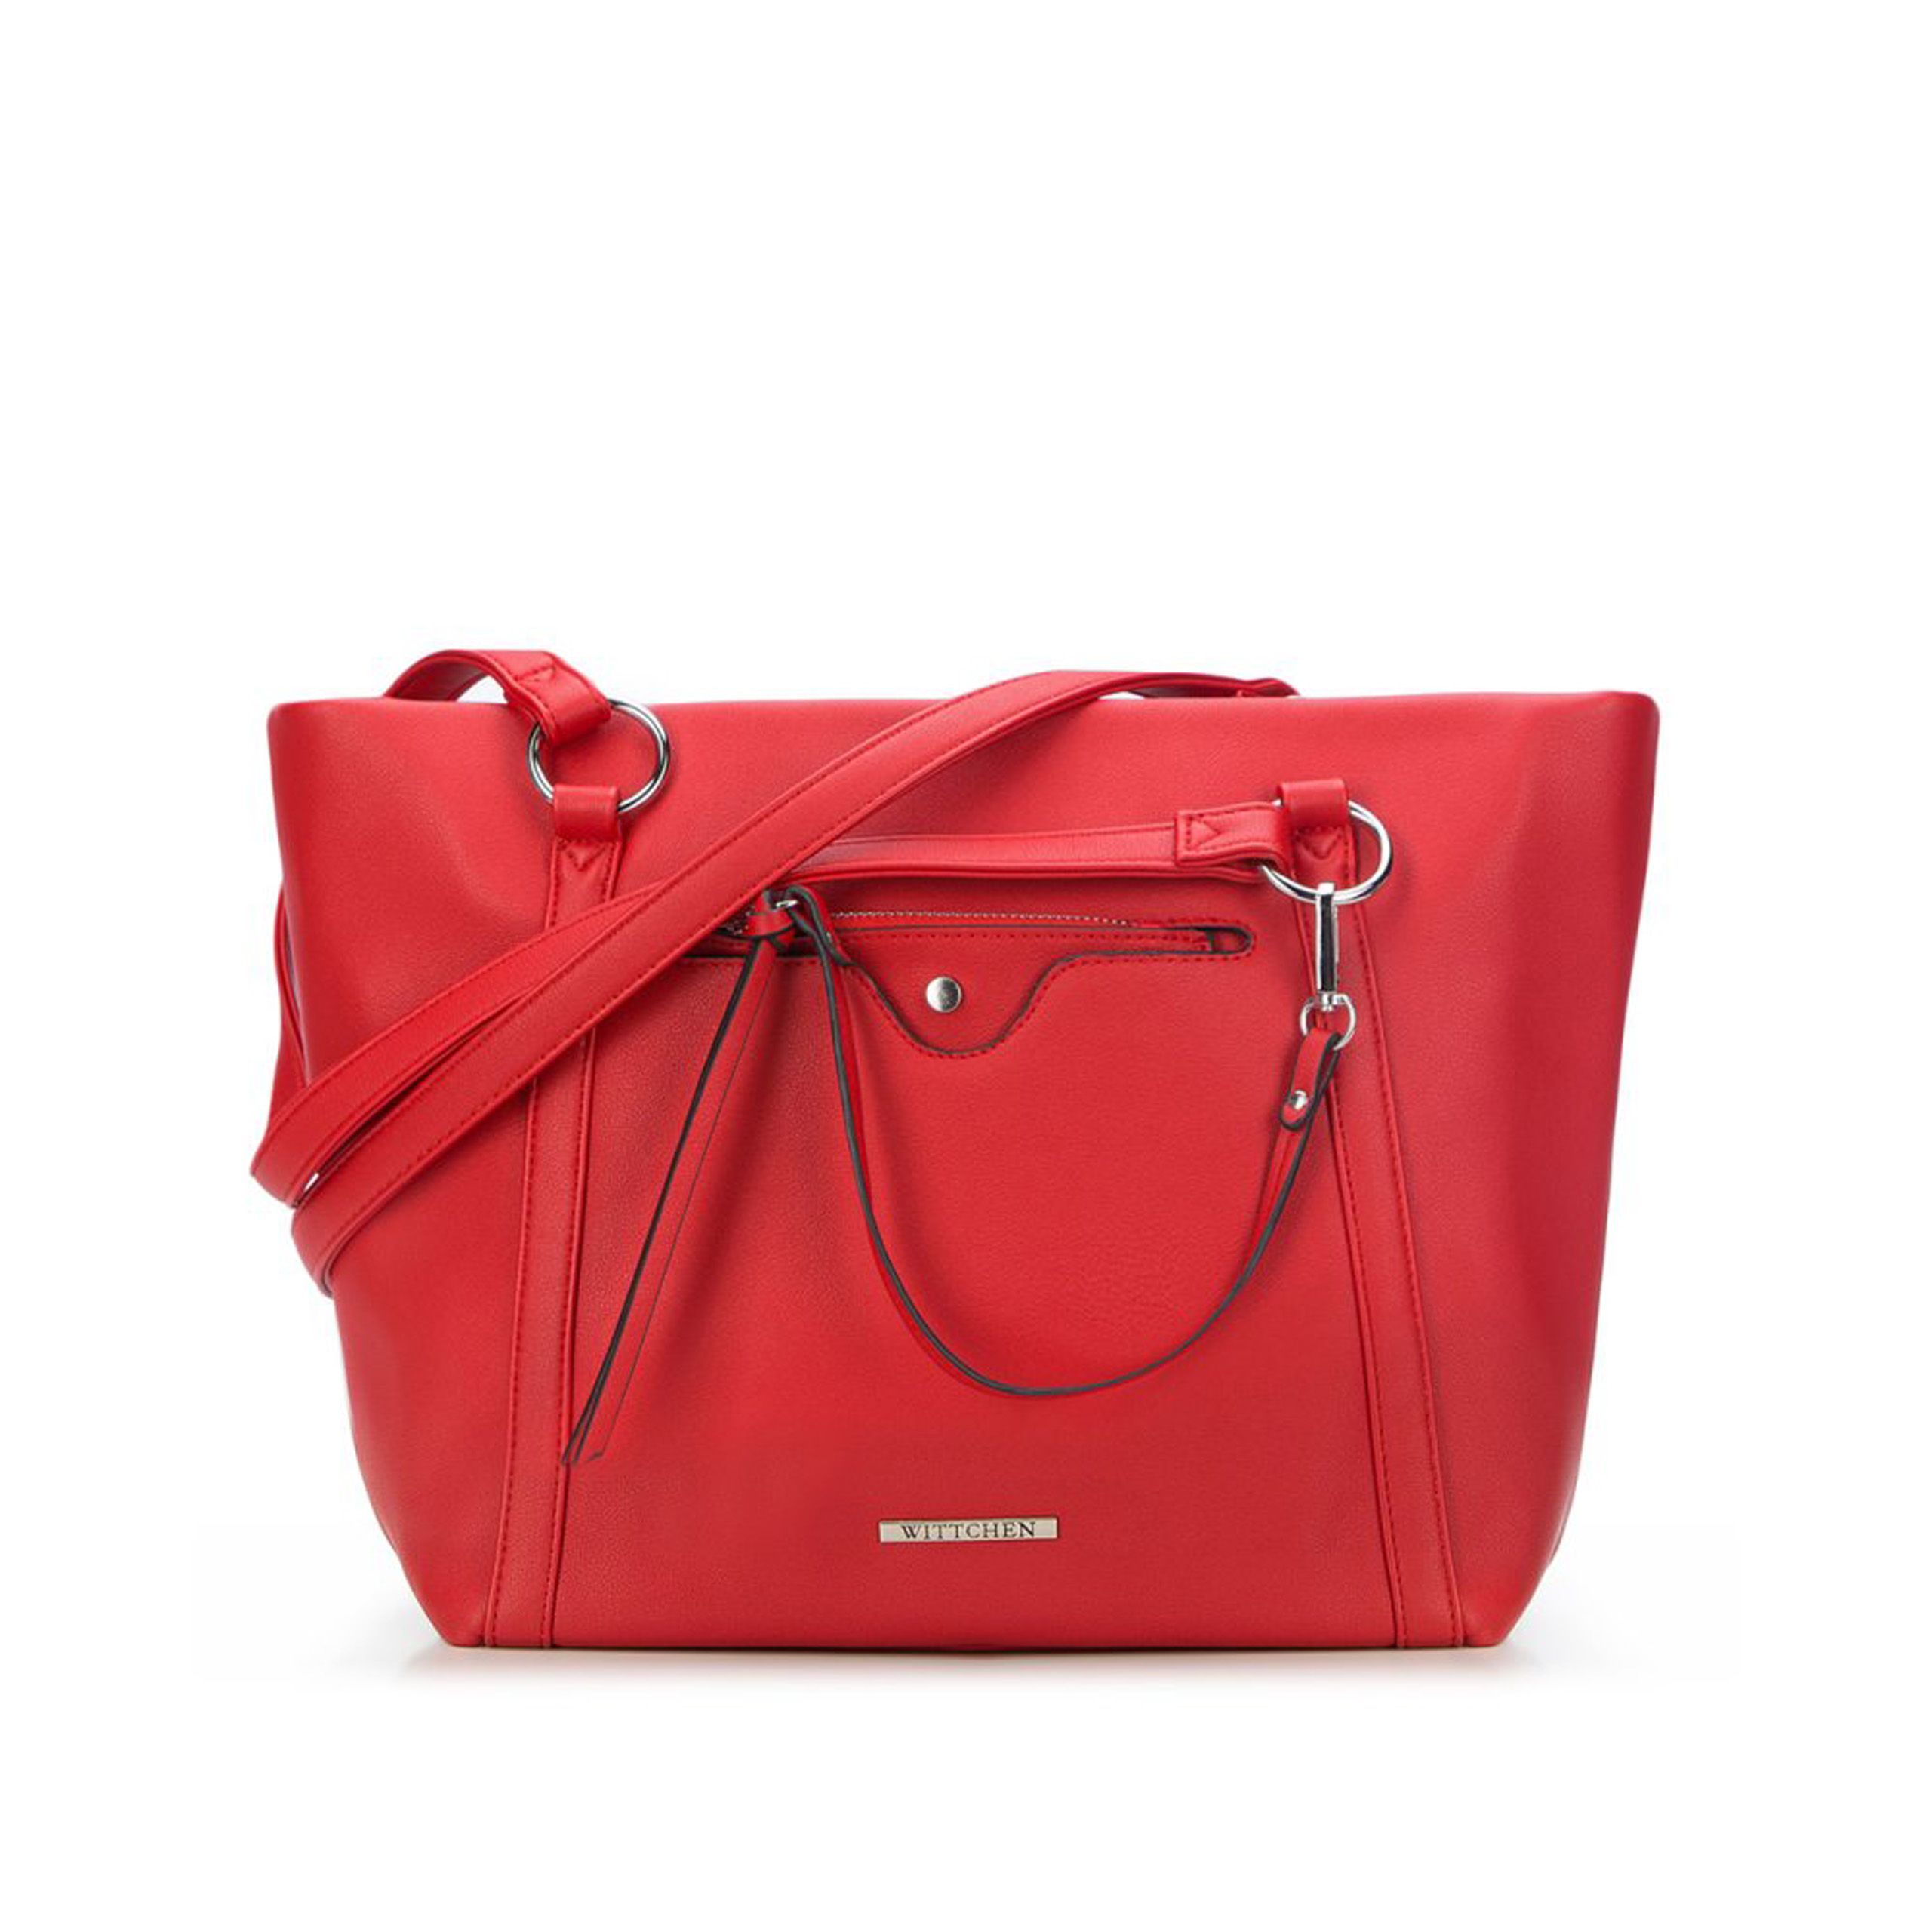 0b114ed08ca09 Torebka Wittchen Young Shopper Bag 87-4Y-405-3 czerwona - New Line